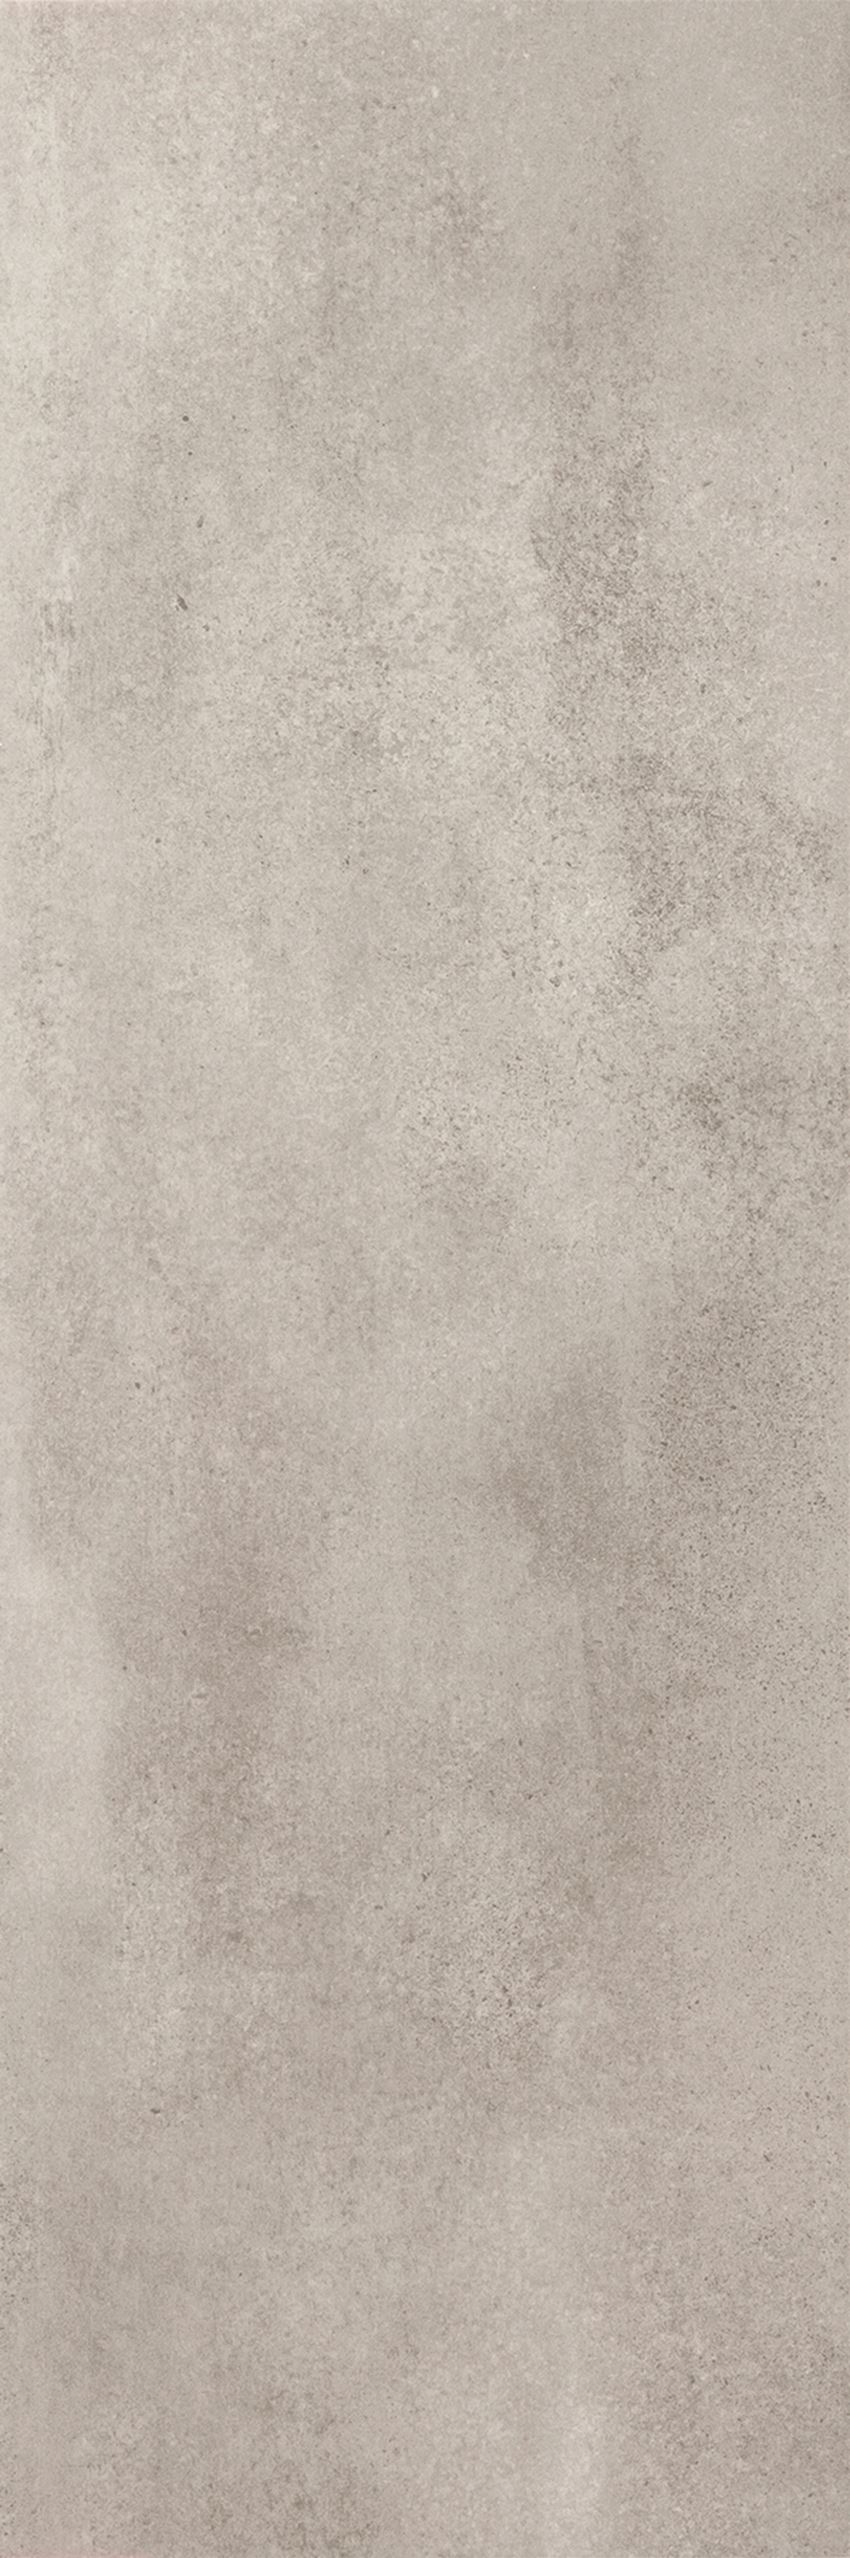 Płytka ścienna 25x75 cm Paradyż Pandora Grafit Ściana Rekt.